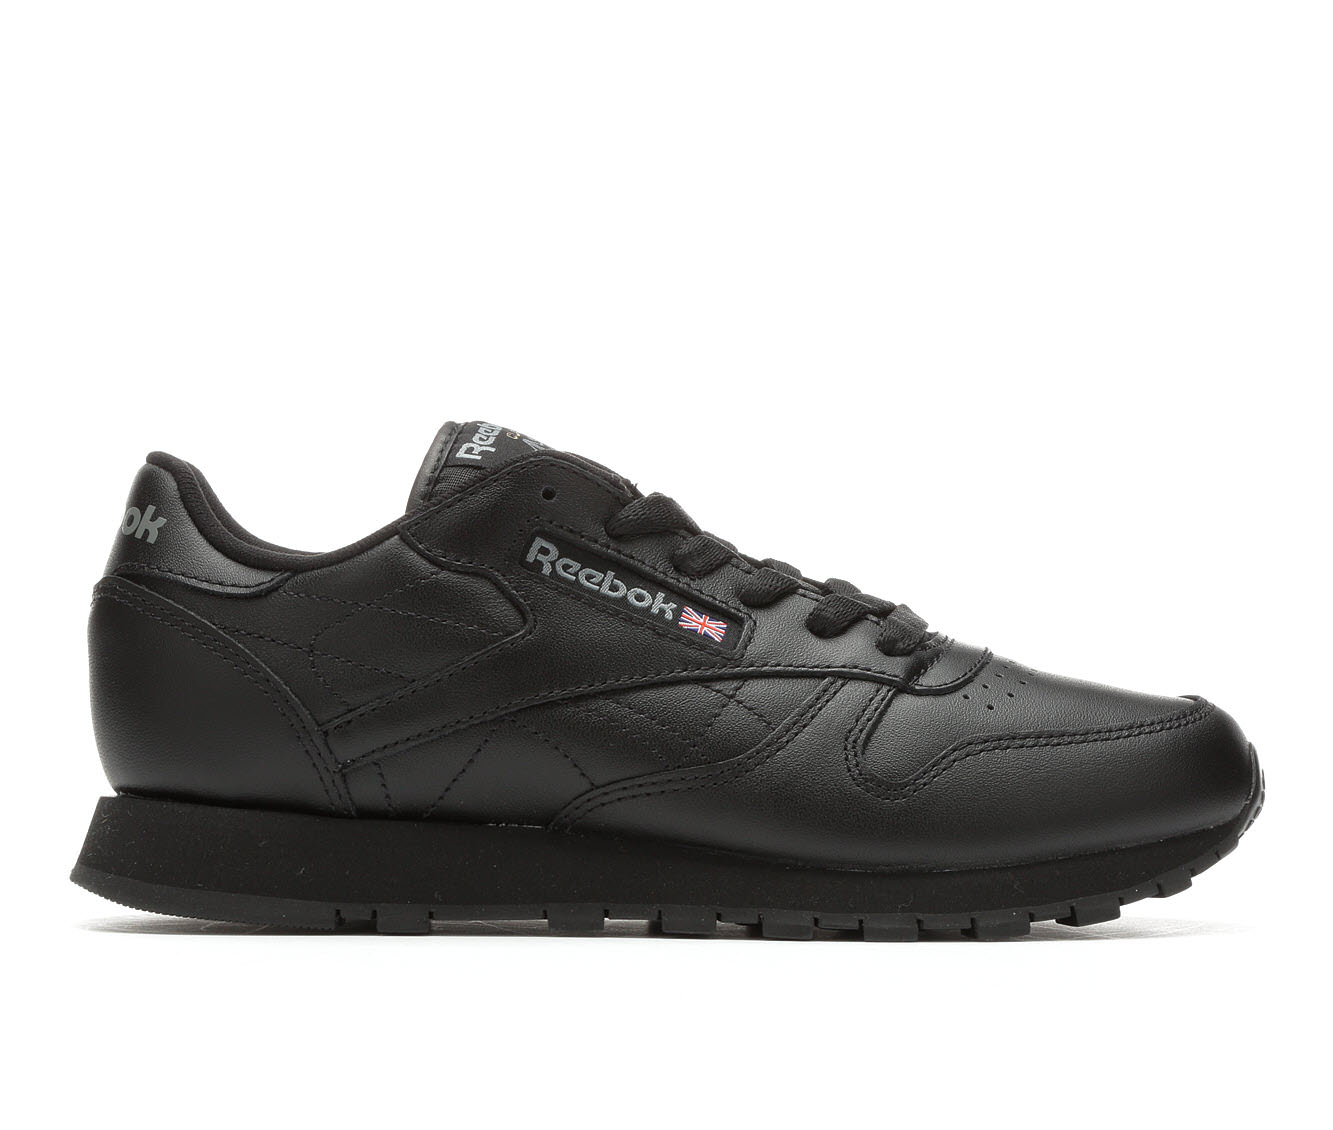 Reebok Classic Leather Jog Women's Athletic Shoe (Black Leather)